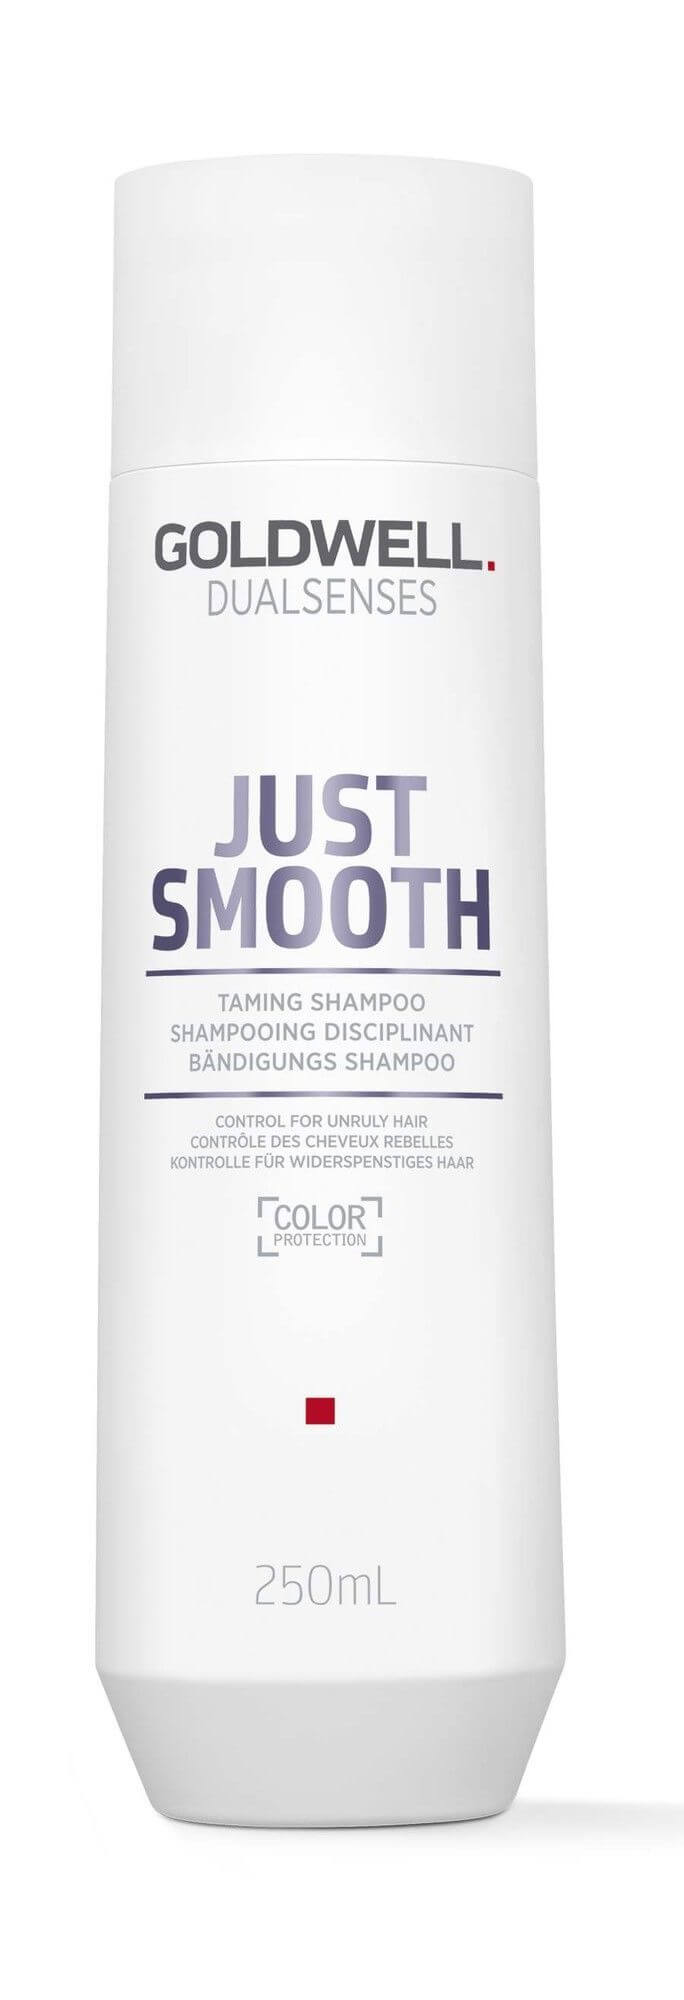 Dualsenses Just Smooth Taming Shampoo.